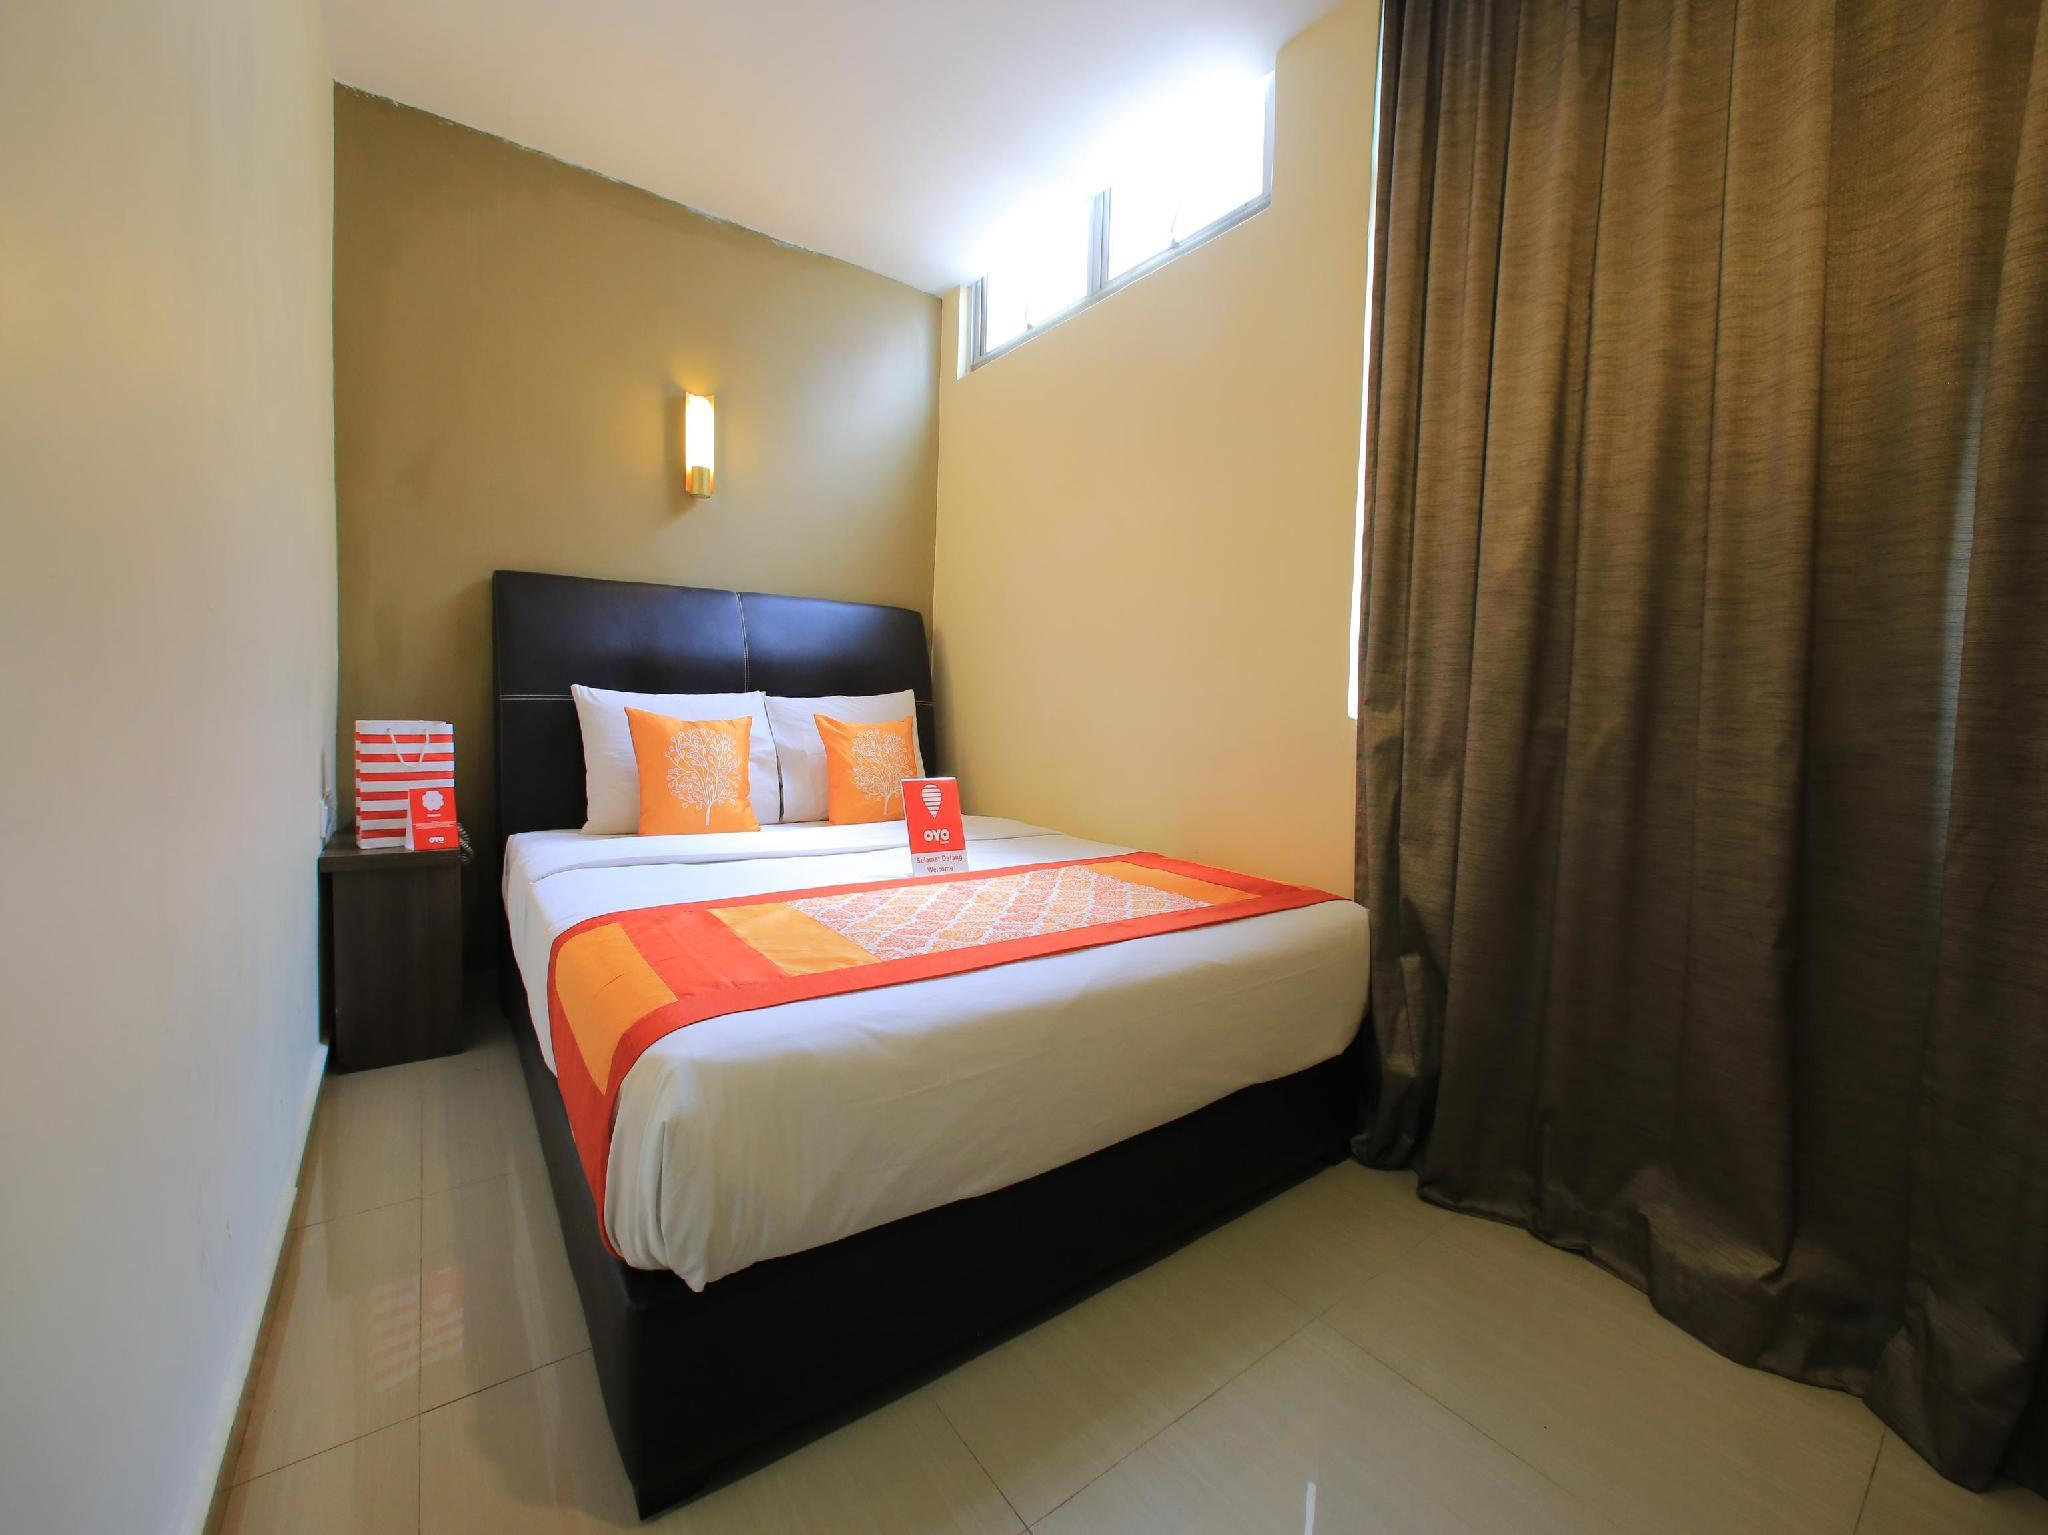 oyo 117 hotel safari 2 in kuala lumpur room deals photos reviews rh agoda com